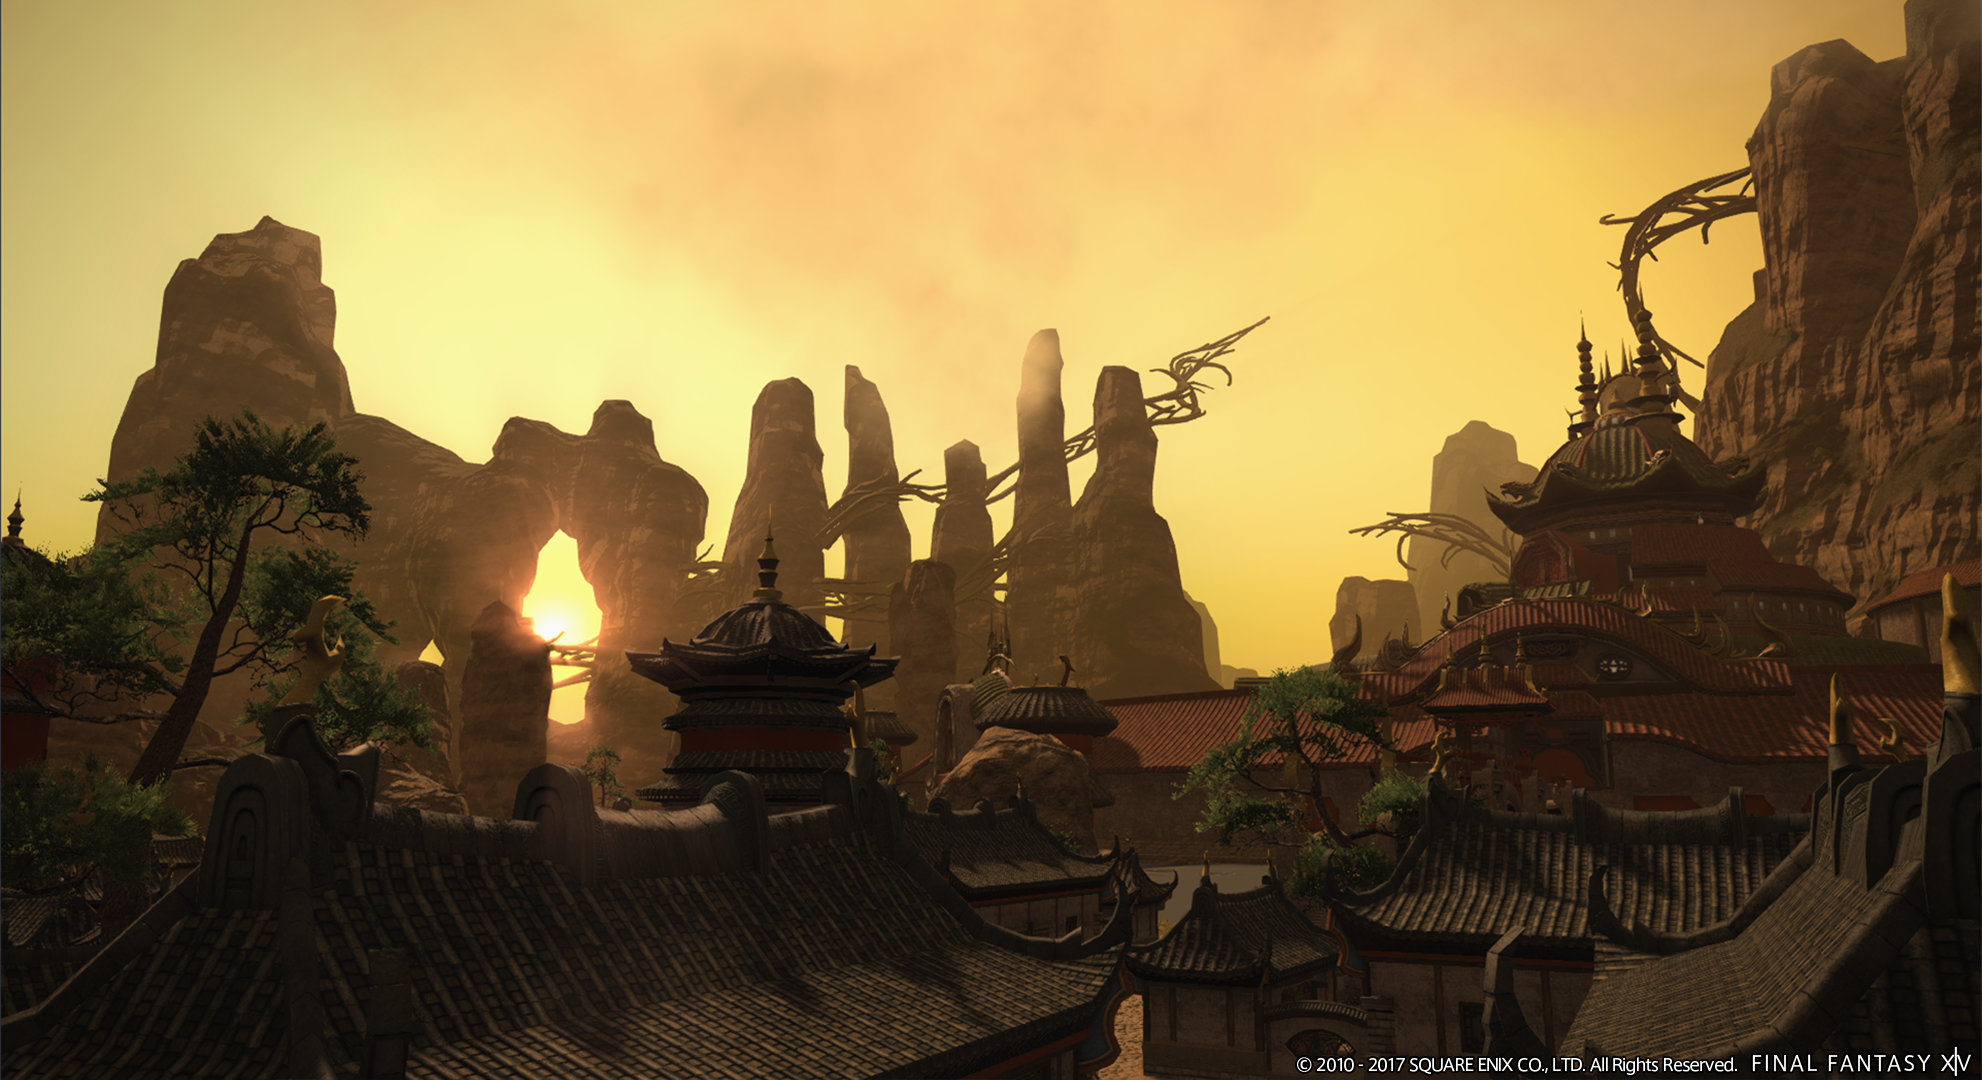 Final Fantasy XIV: Stormblood Image 13